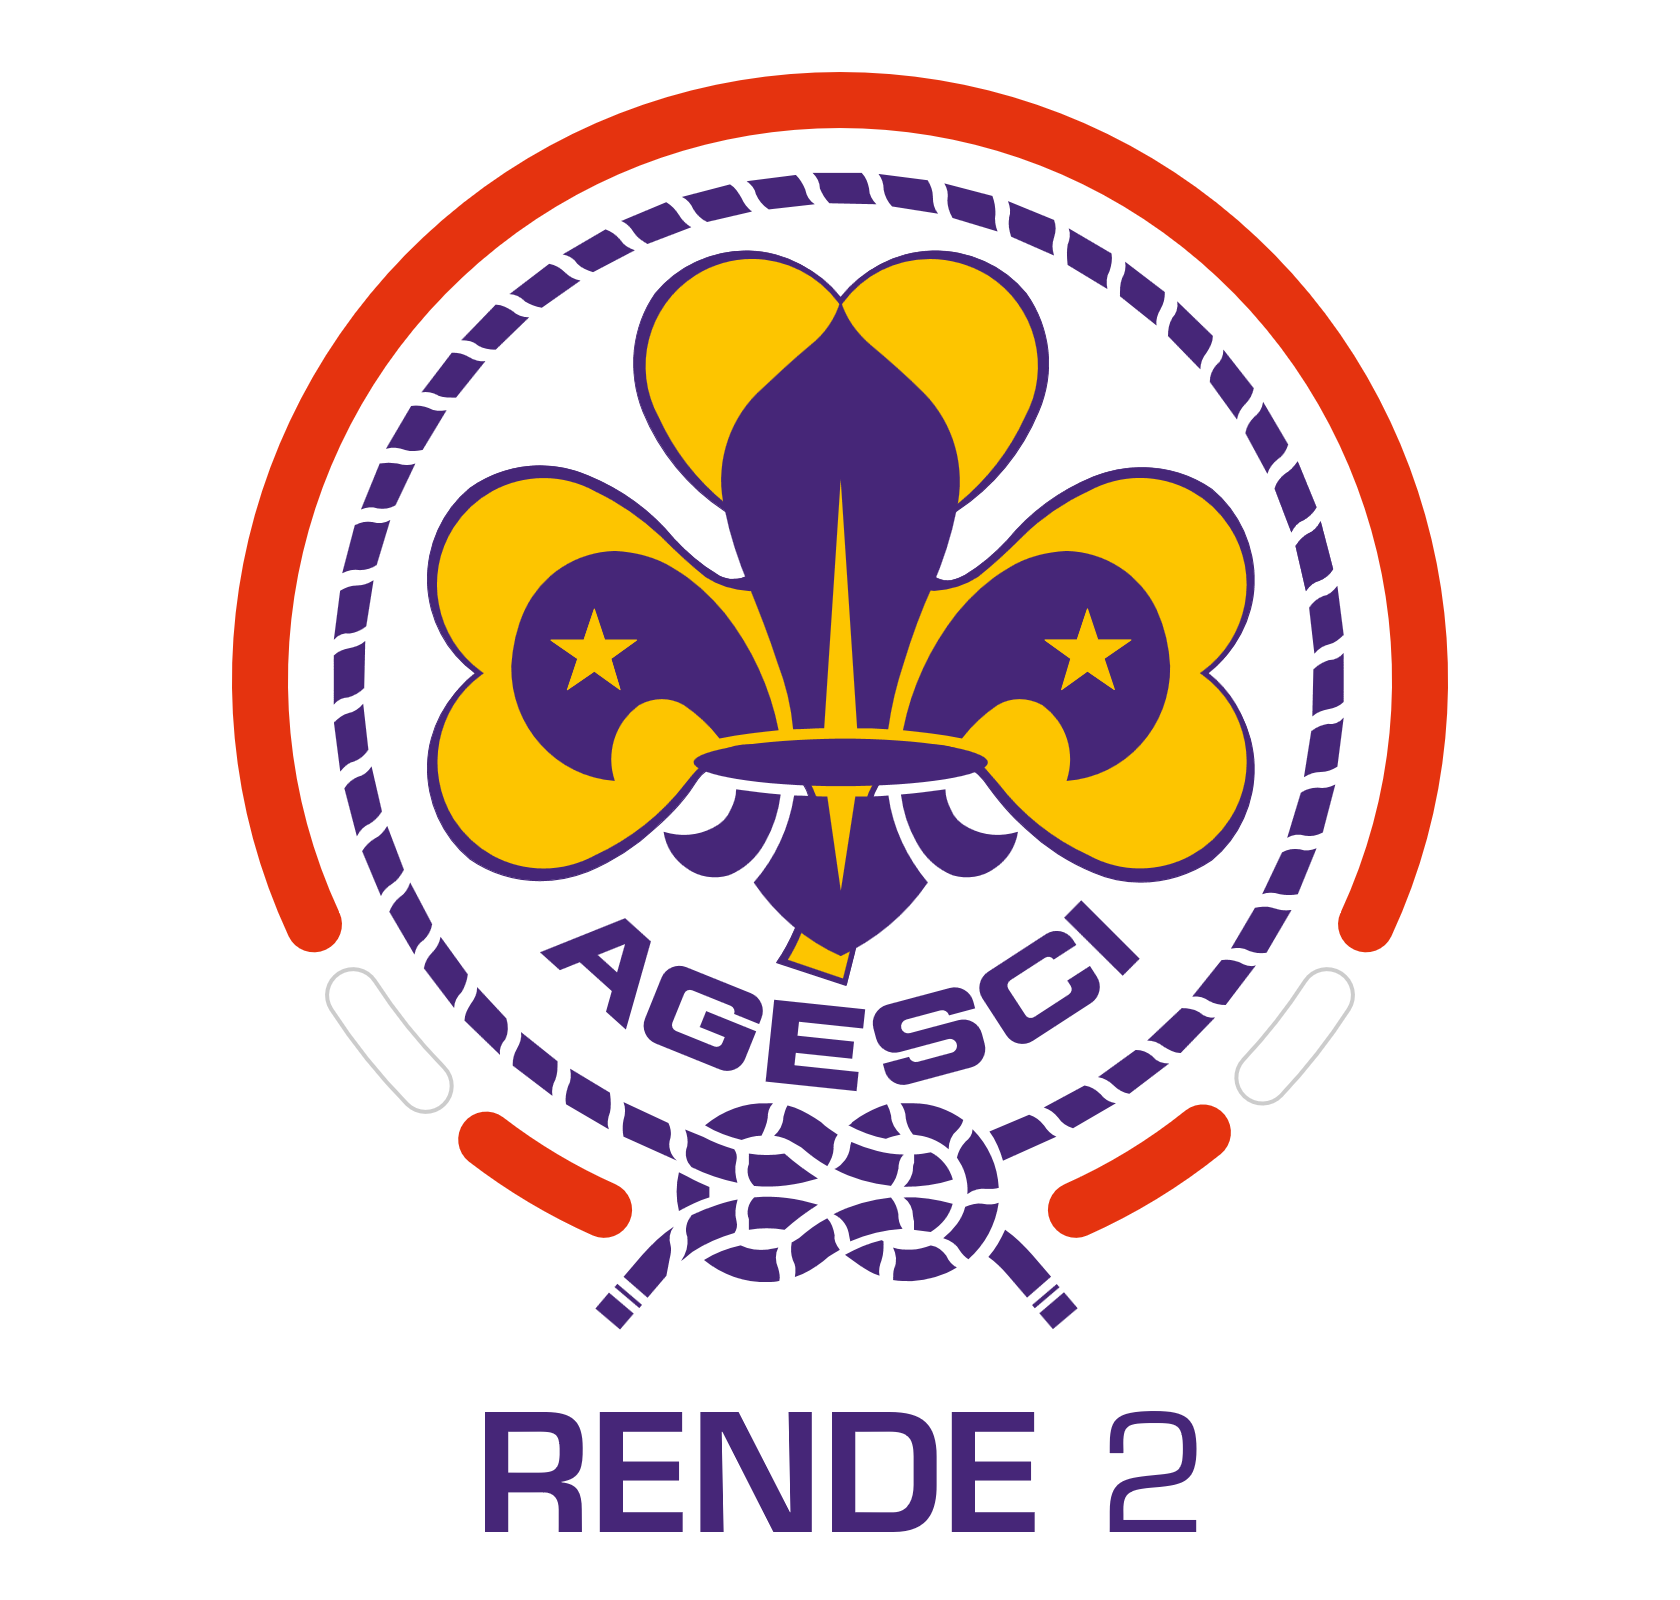 RENDE2_Colore_HiRes